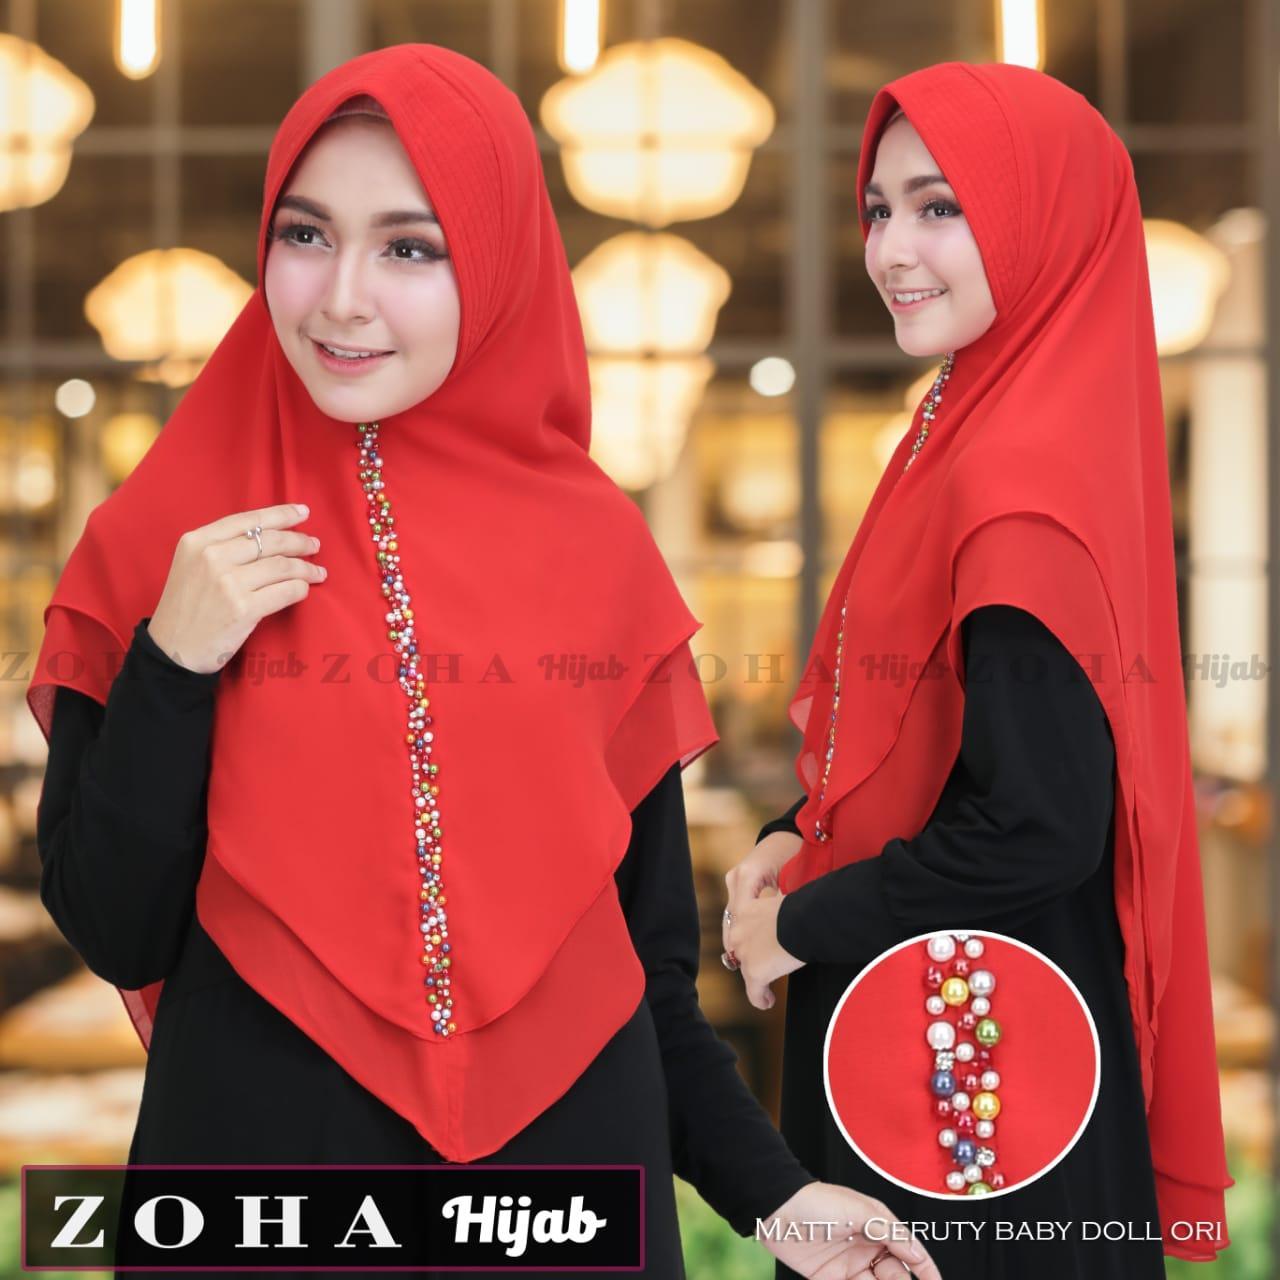 TERLARIS TERMURAH !!!JILBAB INSTAN / KERUDUNG INSTAN / BERGO INSTAN BY ZOYA hijab